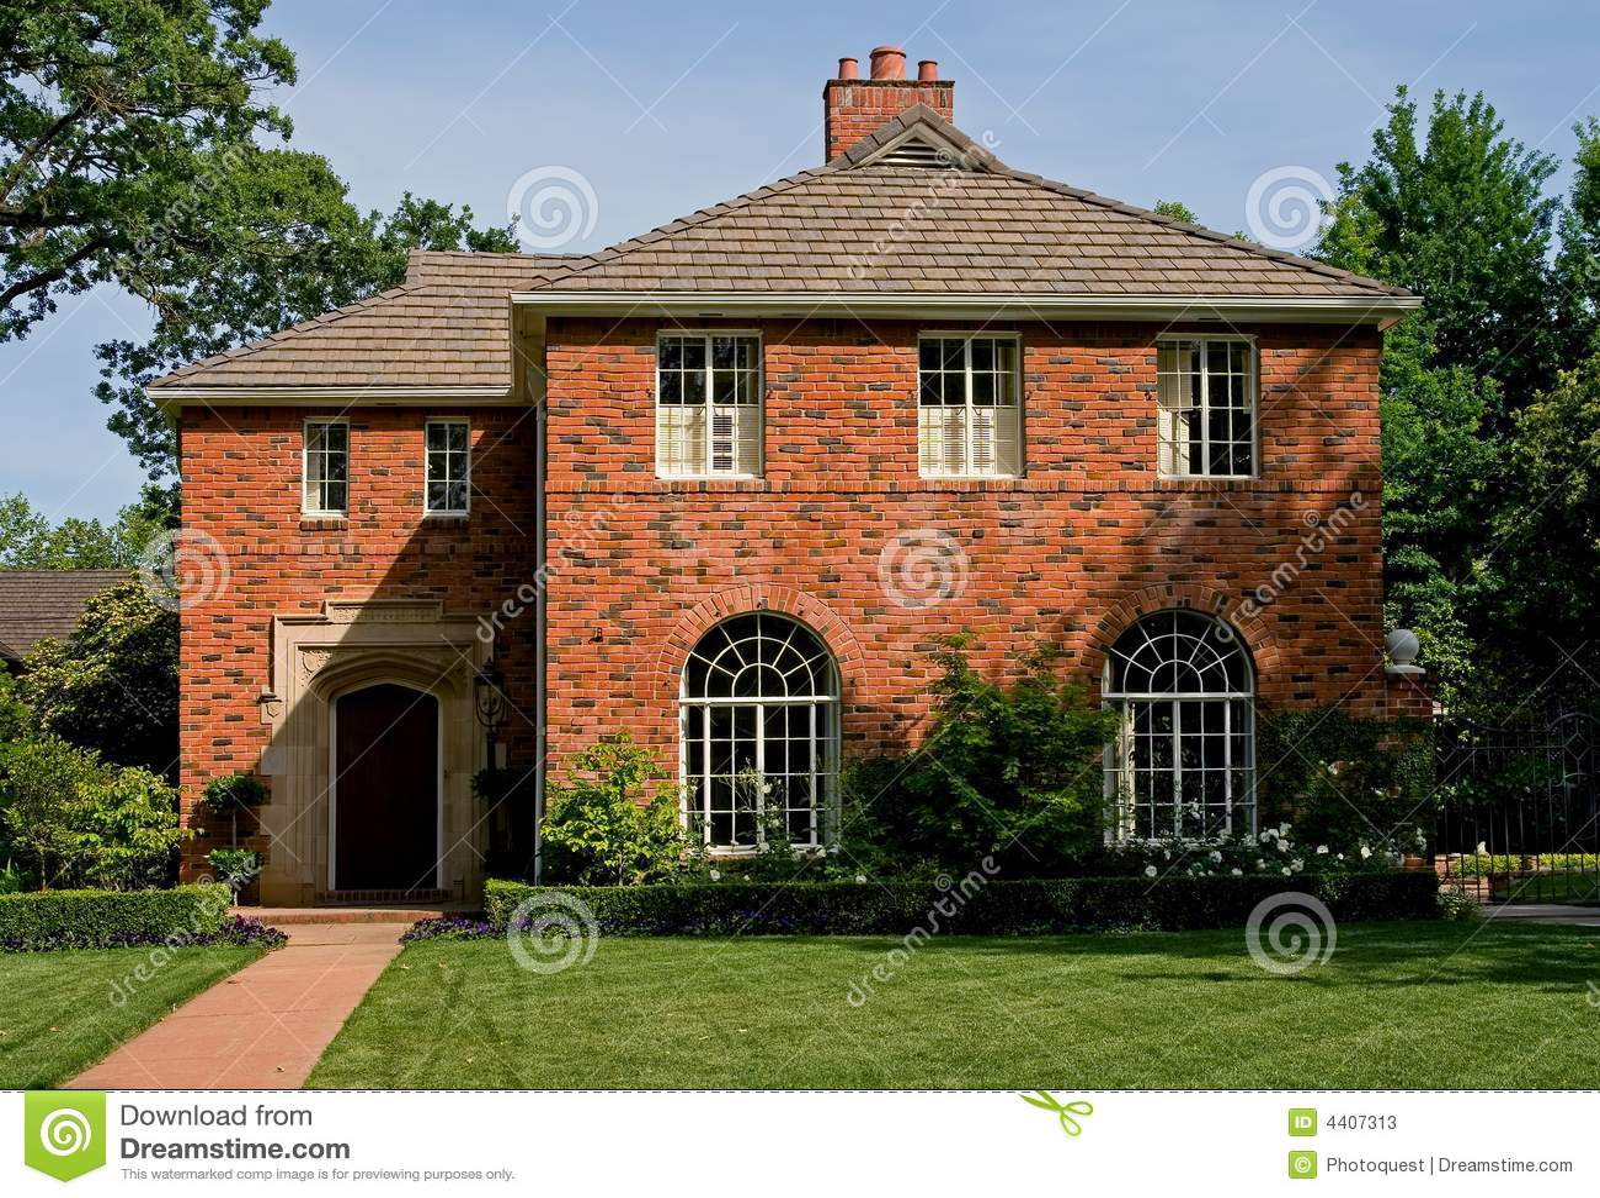 Beautiful Old Brick House